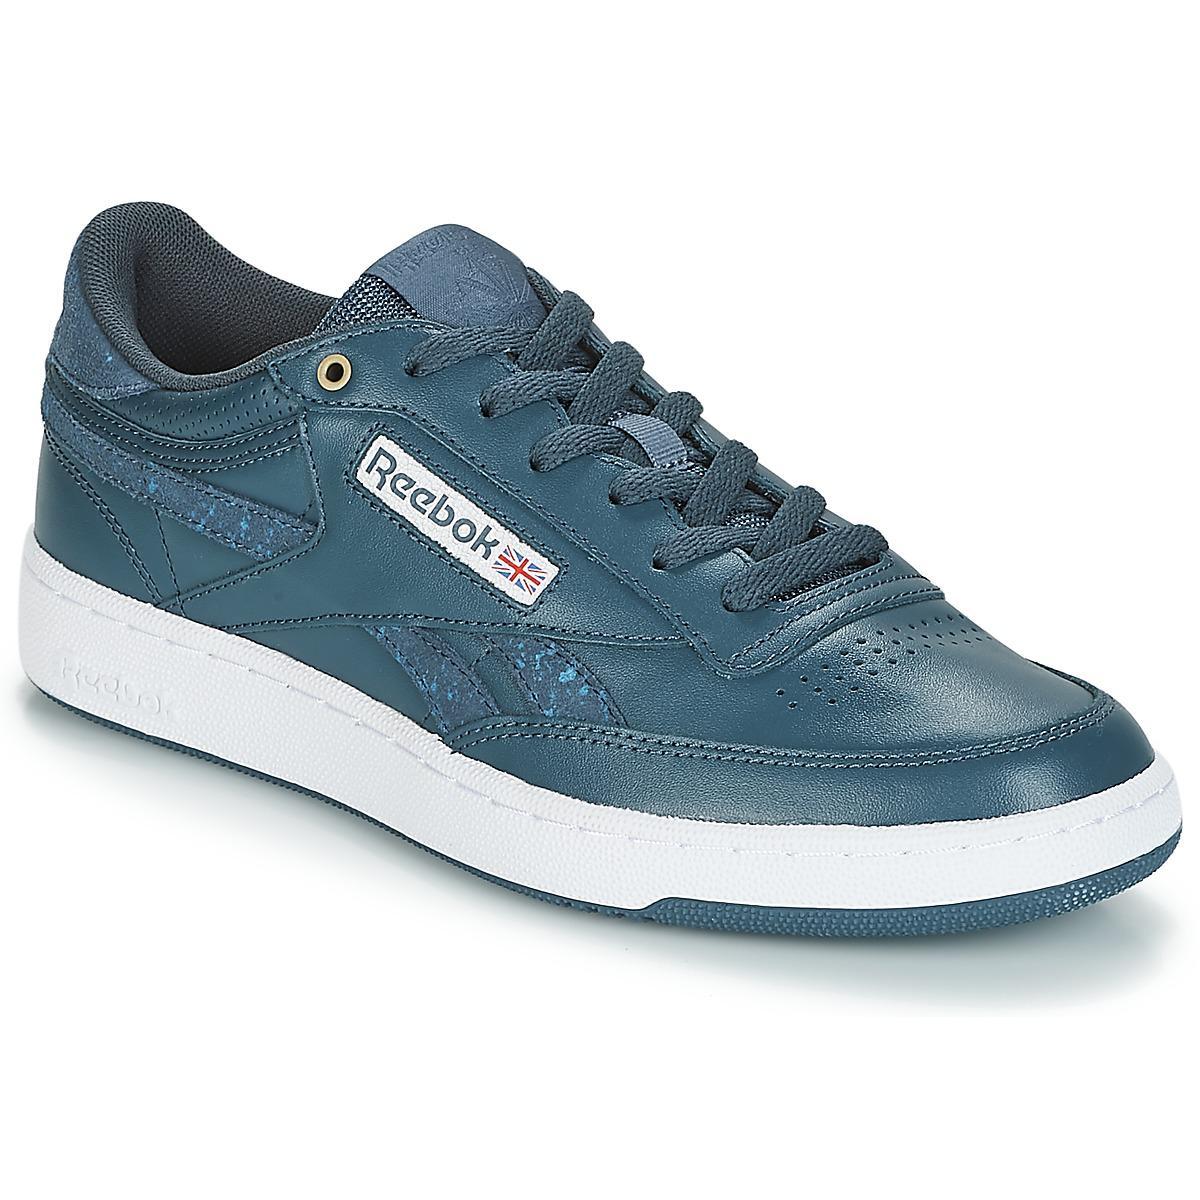 Reebok Revenge Plus Mu Men s Shoes (trainers) In Blue in Blue for ... 19e0edc12